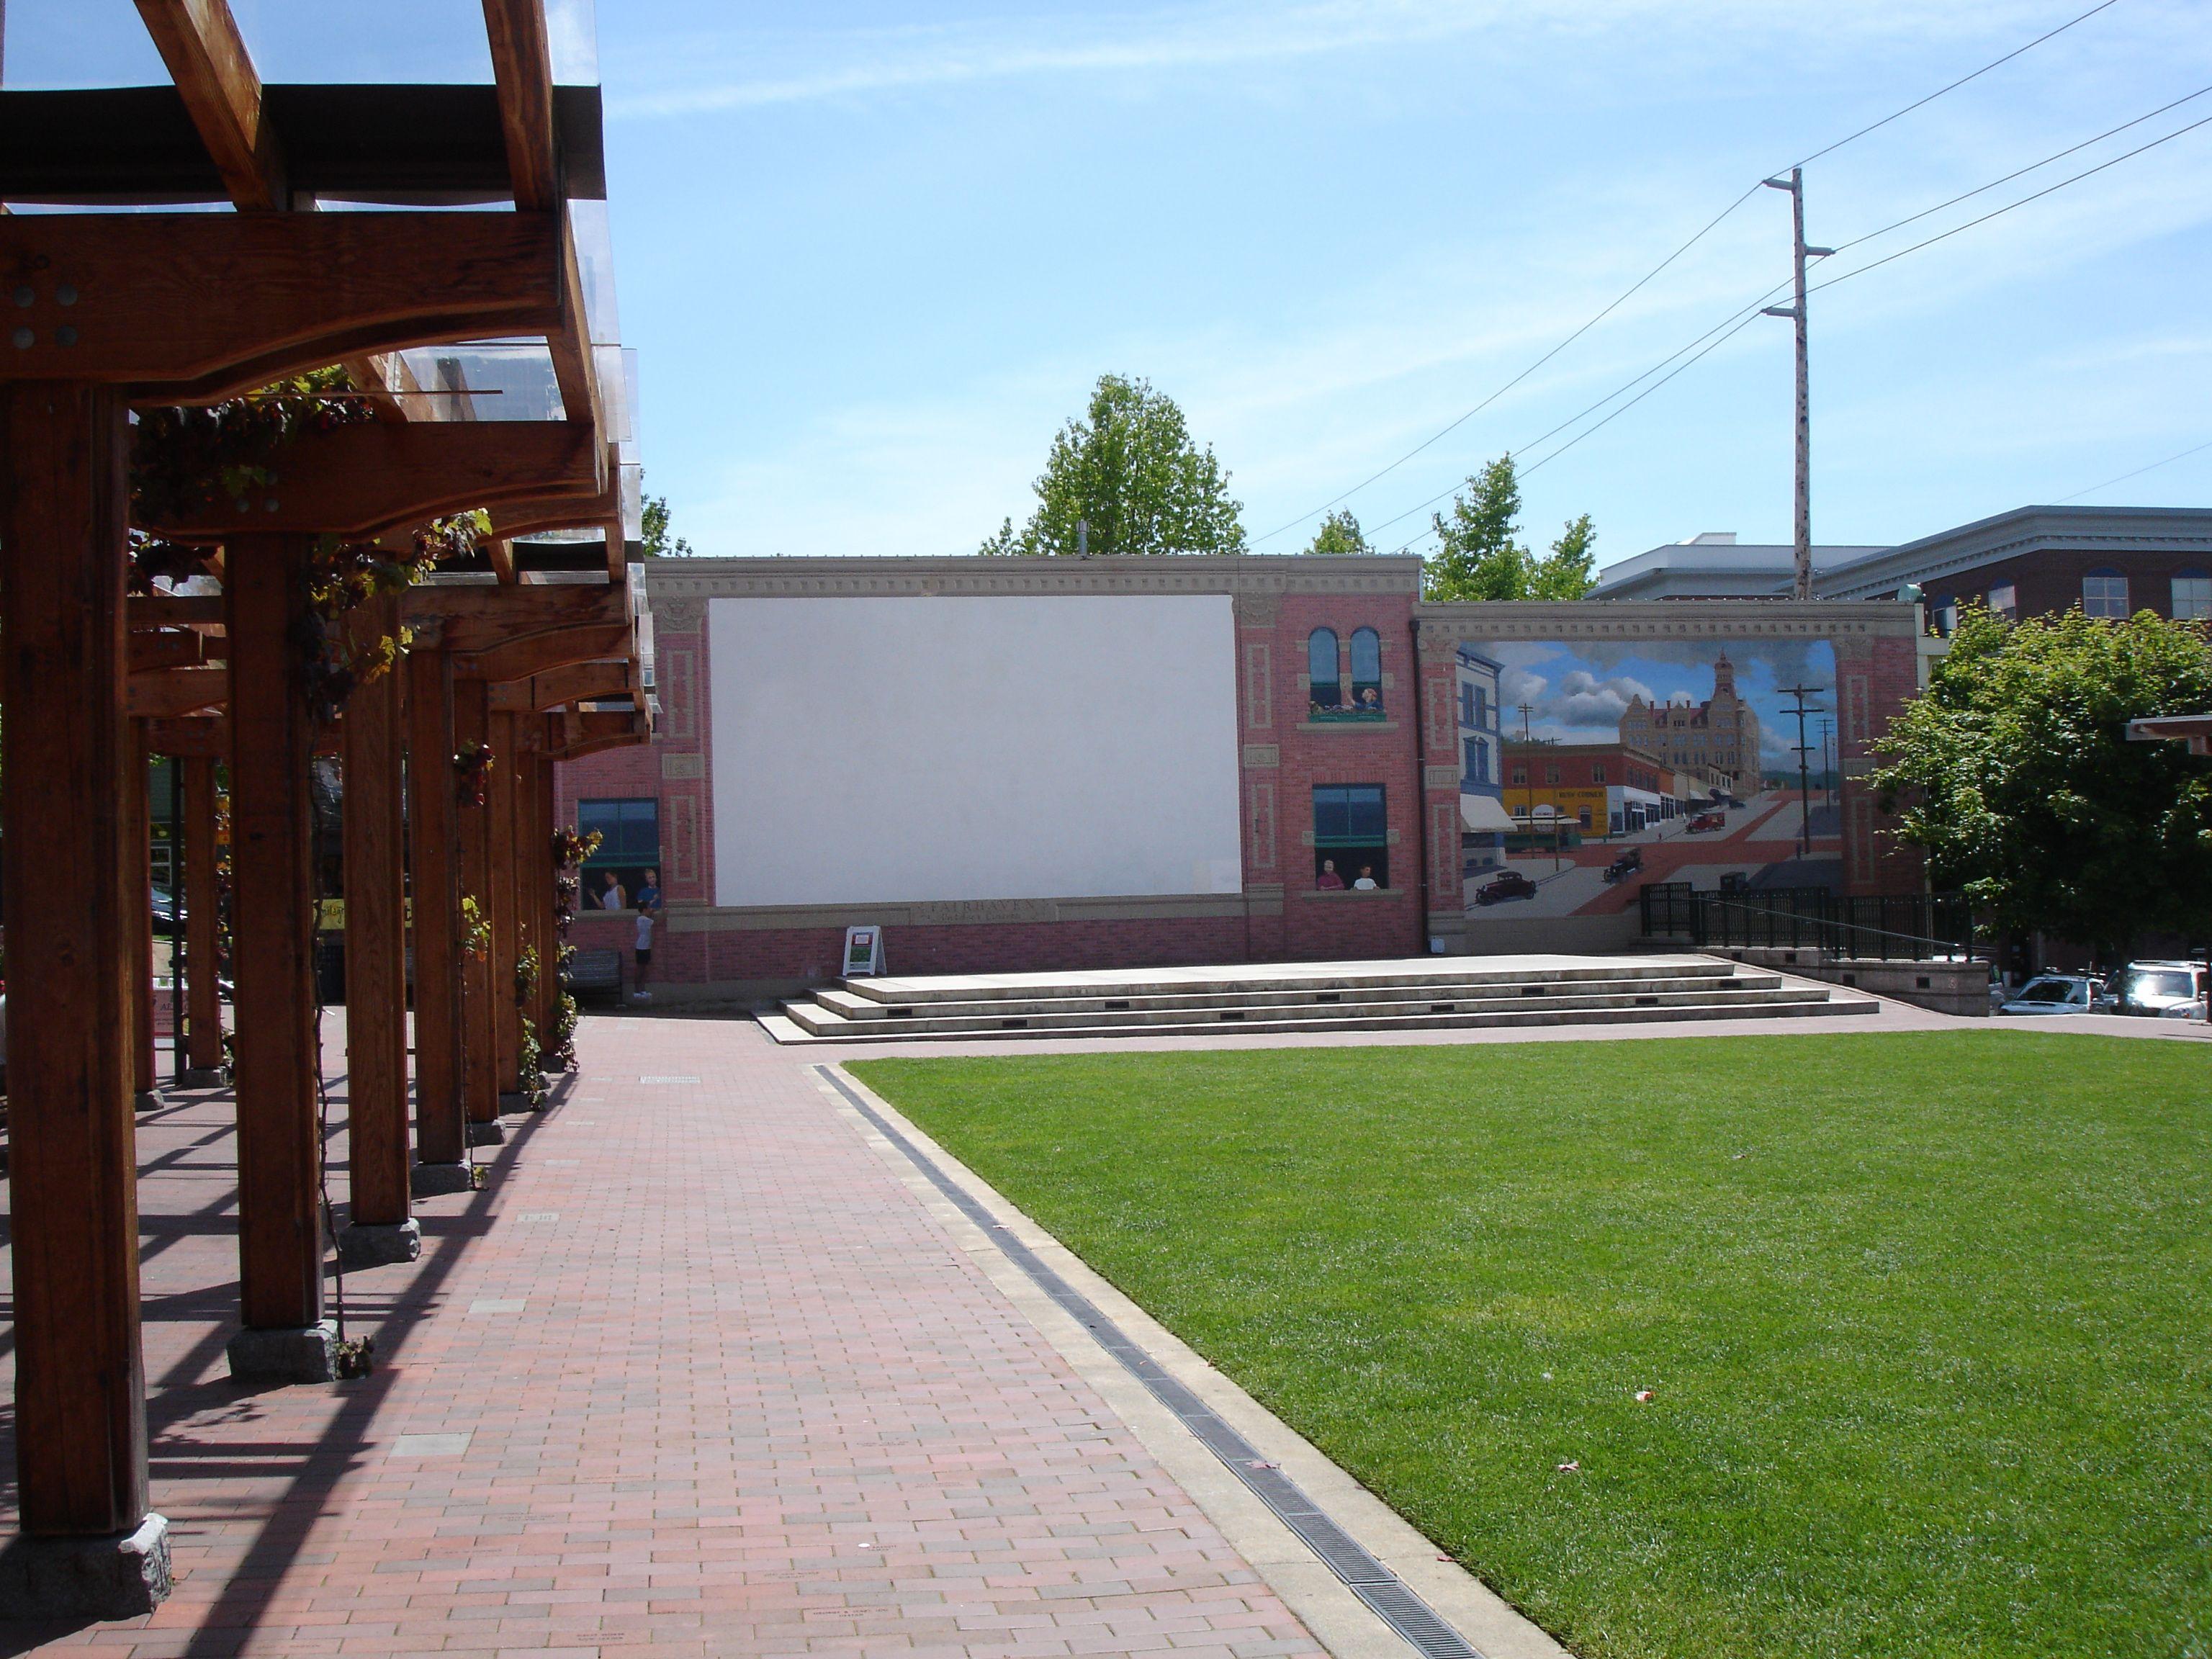 Fairhaven Outdoor Cinema, Bellingham, Washington USA